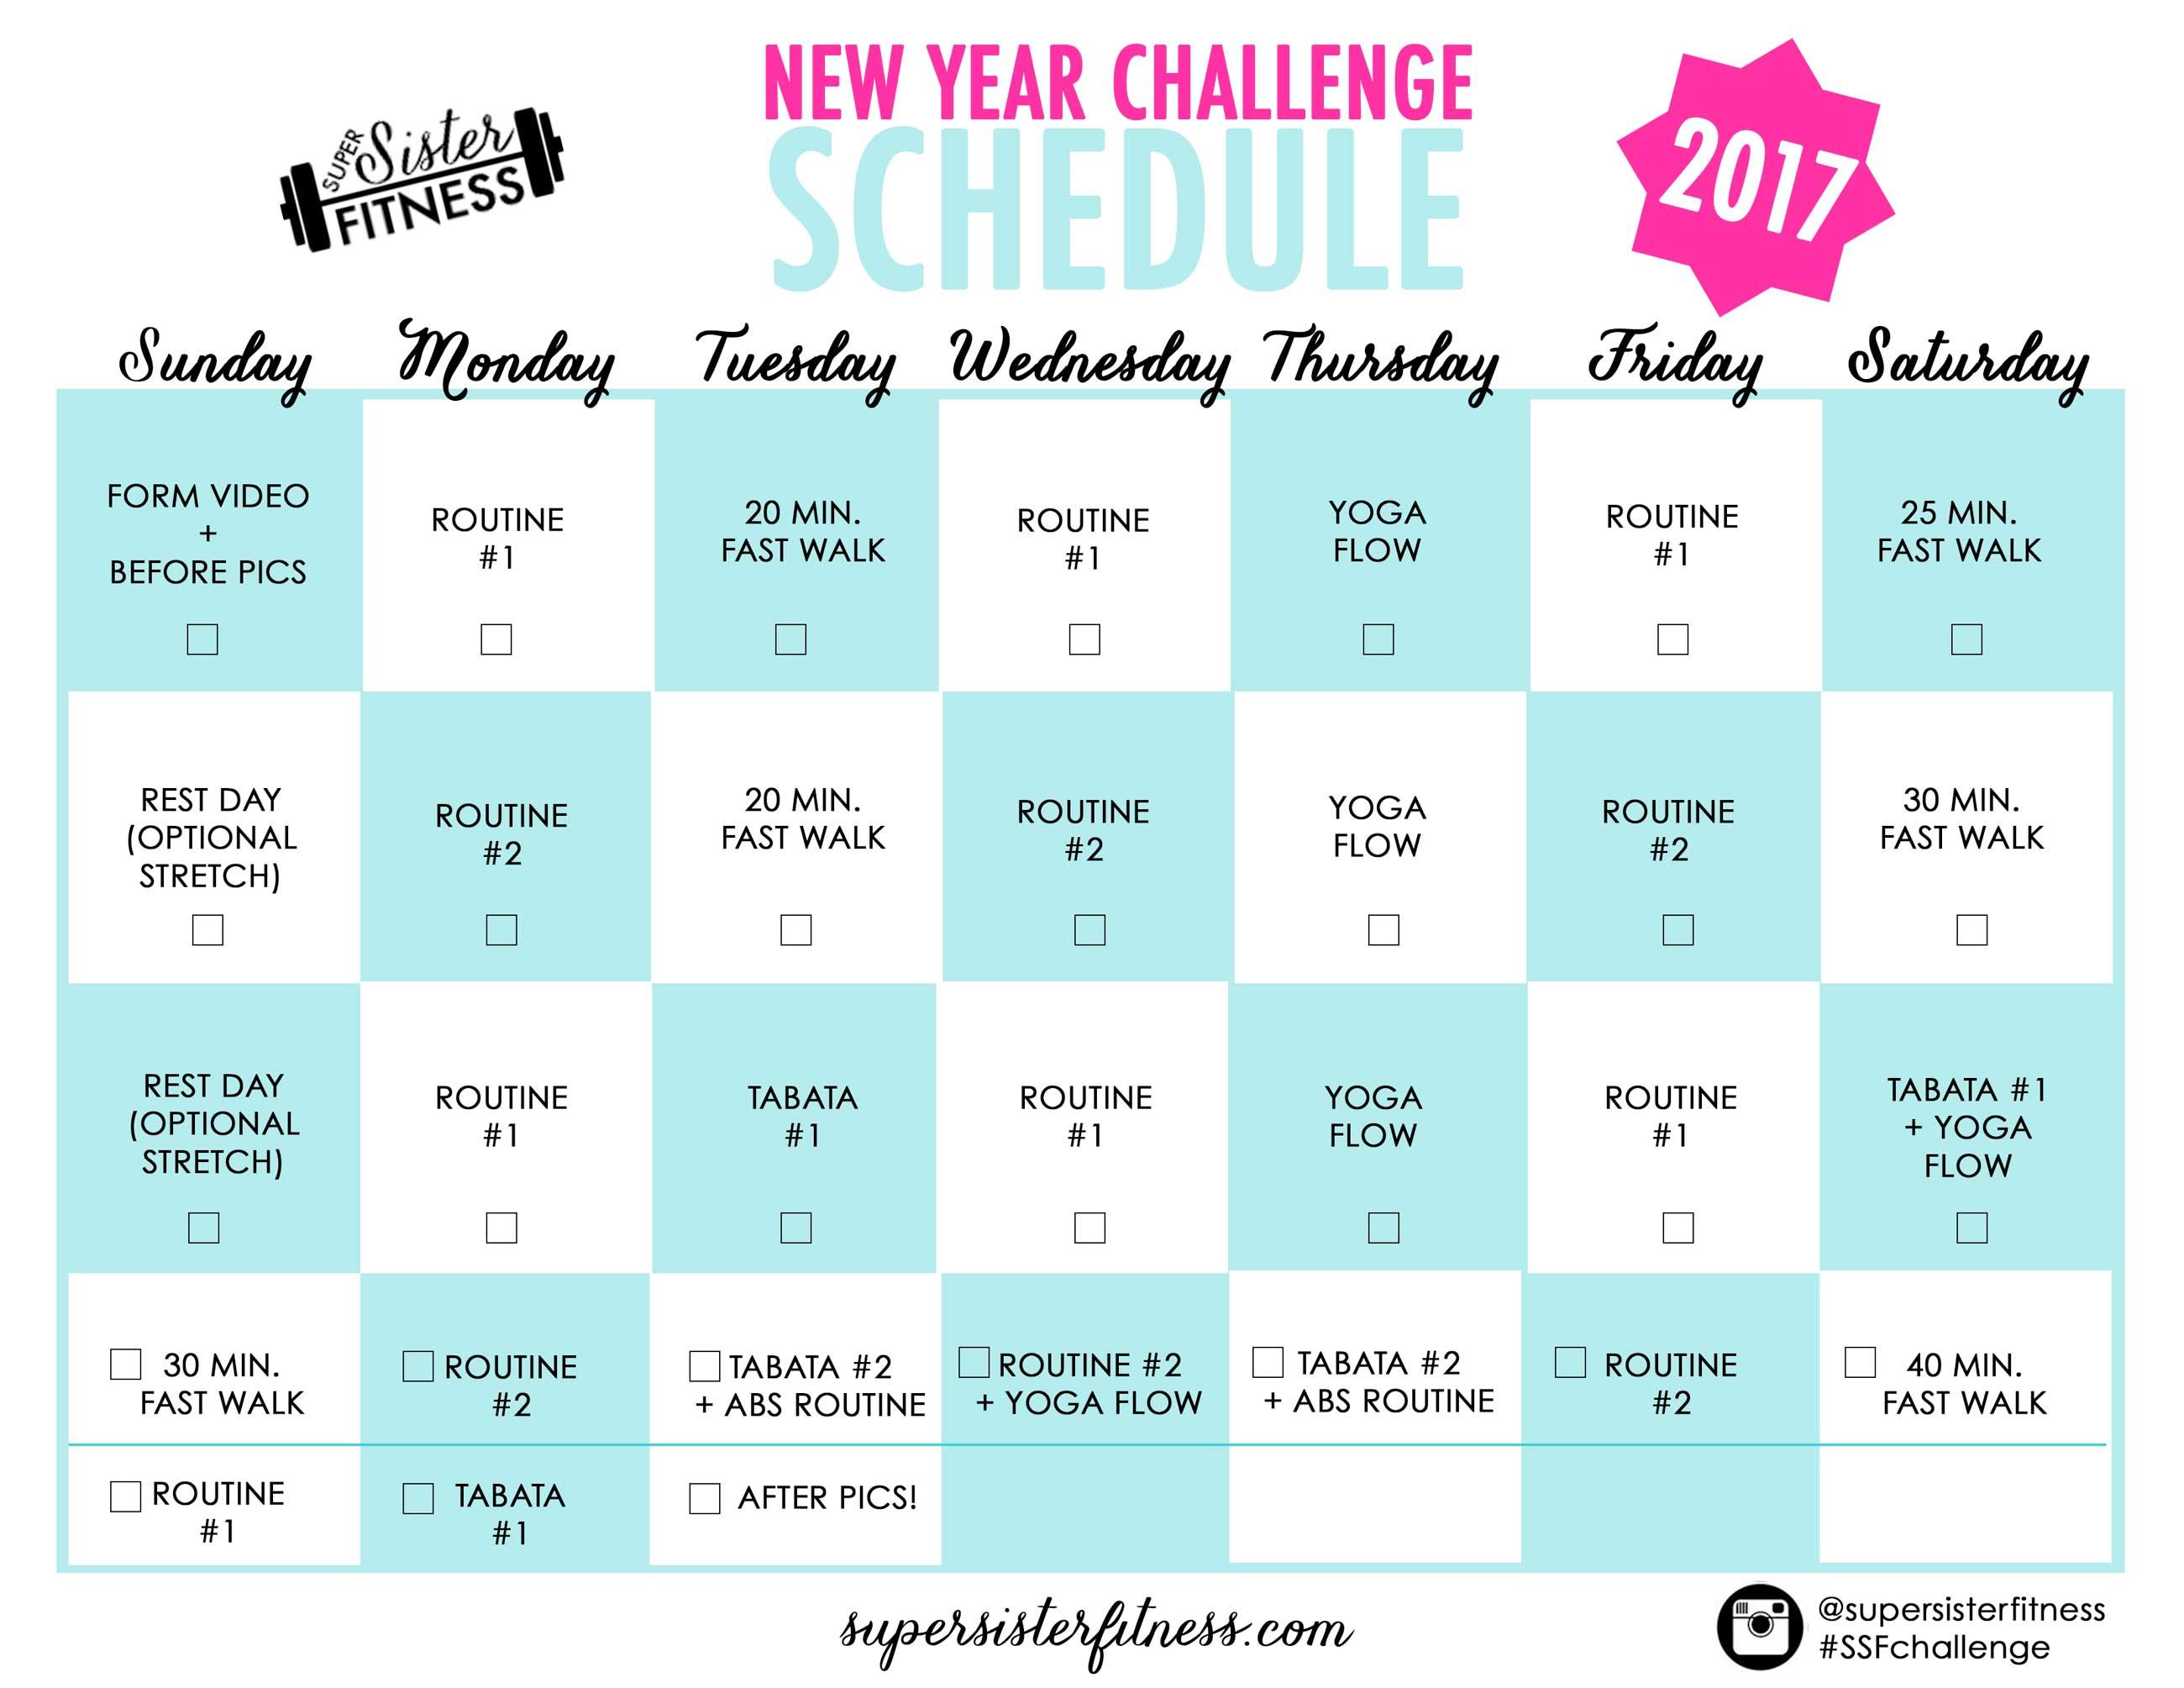 Calendar Challenge : Free new year fitness challenge starts jan